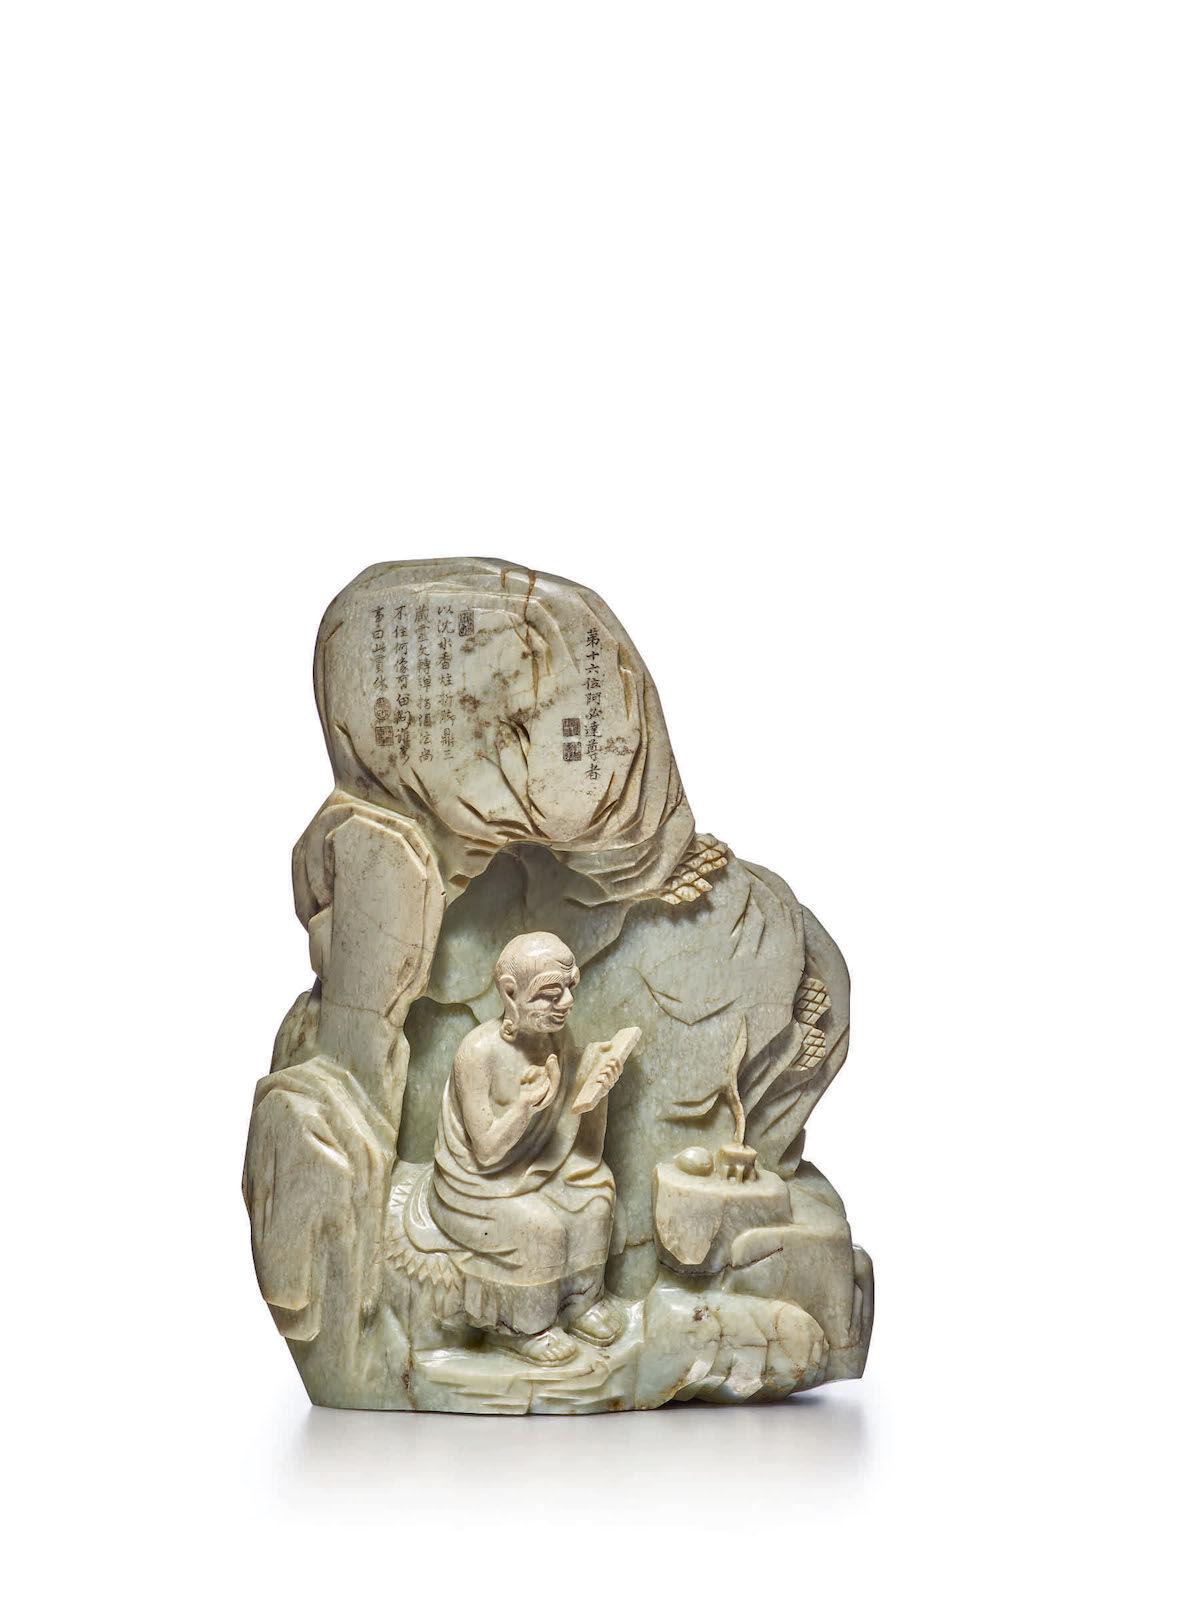 A Celadon Jade 'Luohan' inscribed boulder. Est. $100,000–150,000. Courtesy Sotheby's.